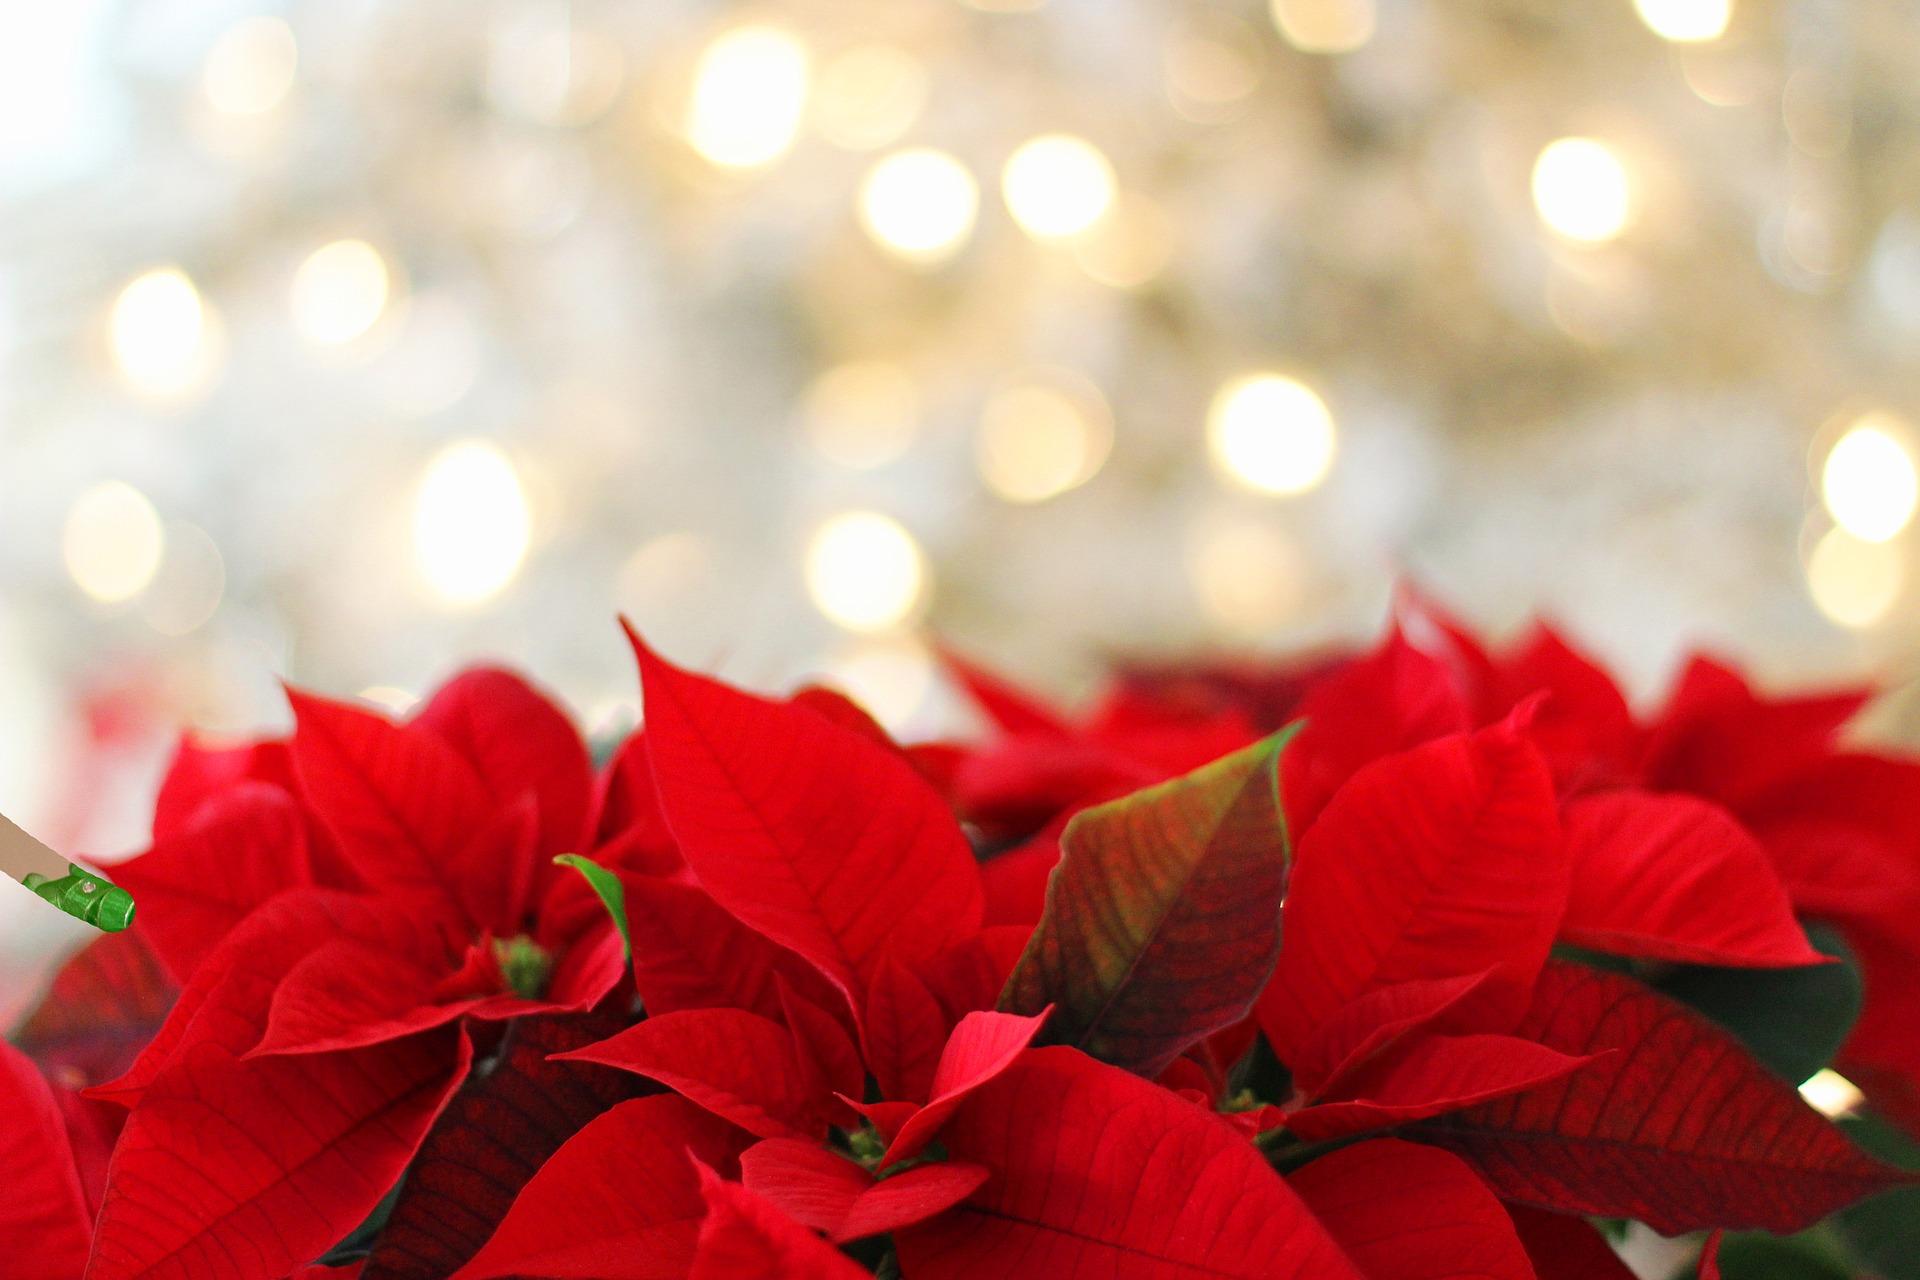 Photo of red poinsettias